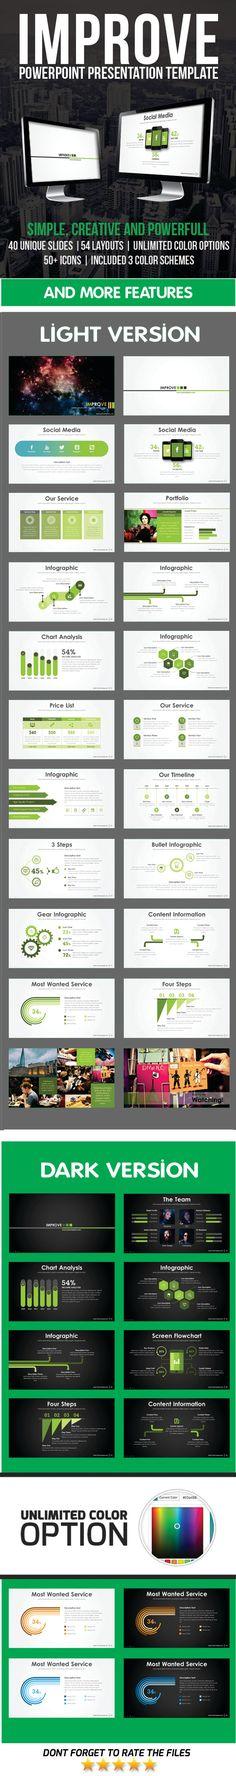 Improve PowerPoint Template Presentation #slides Download: http://graphicriver.net/item/improve-powerpoint-template/11628383?ref=ksioks